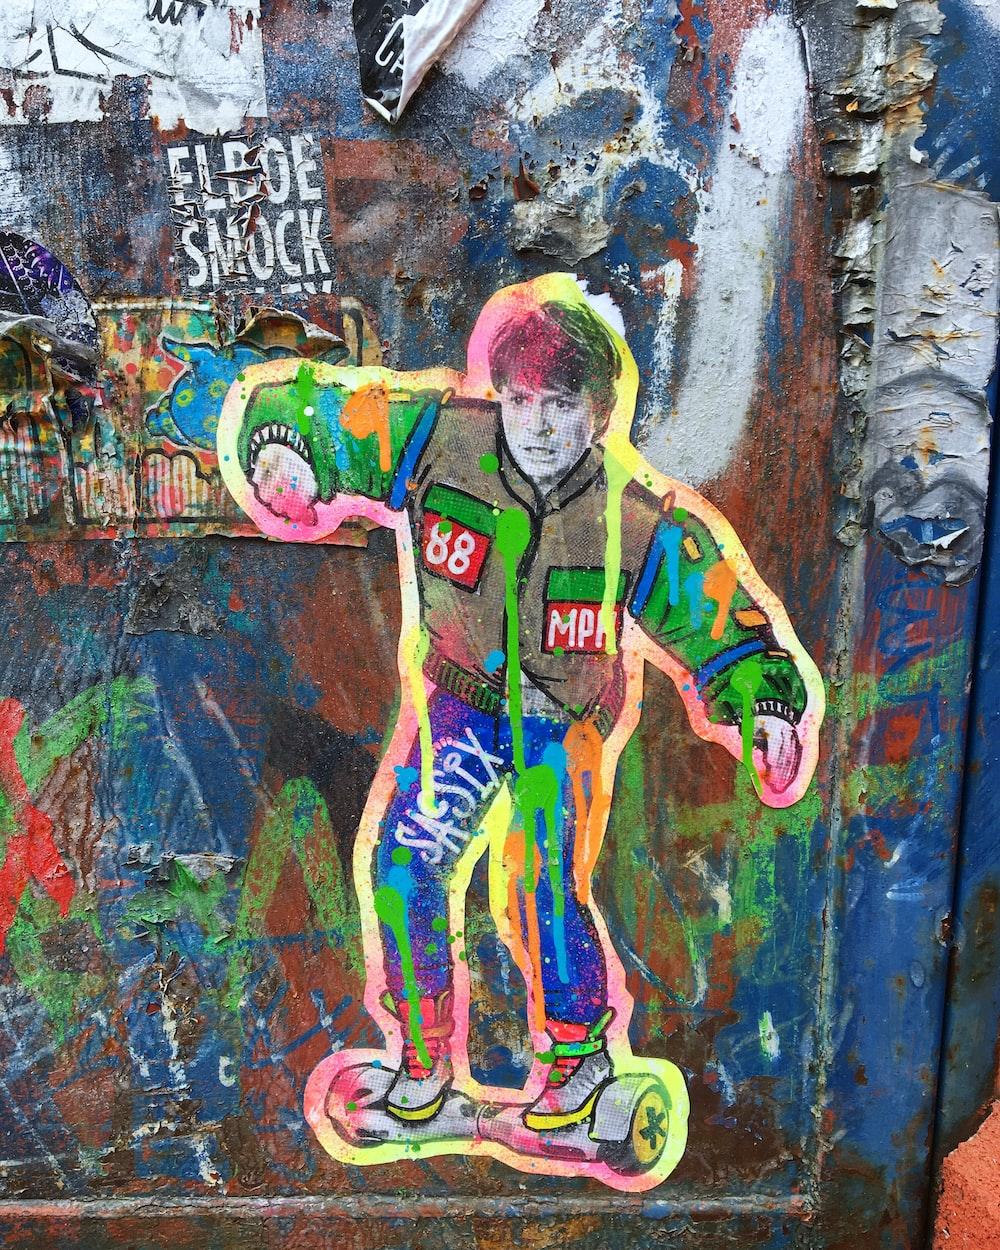 man riding on self balancing board graffiti